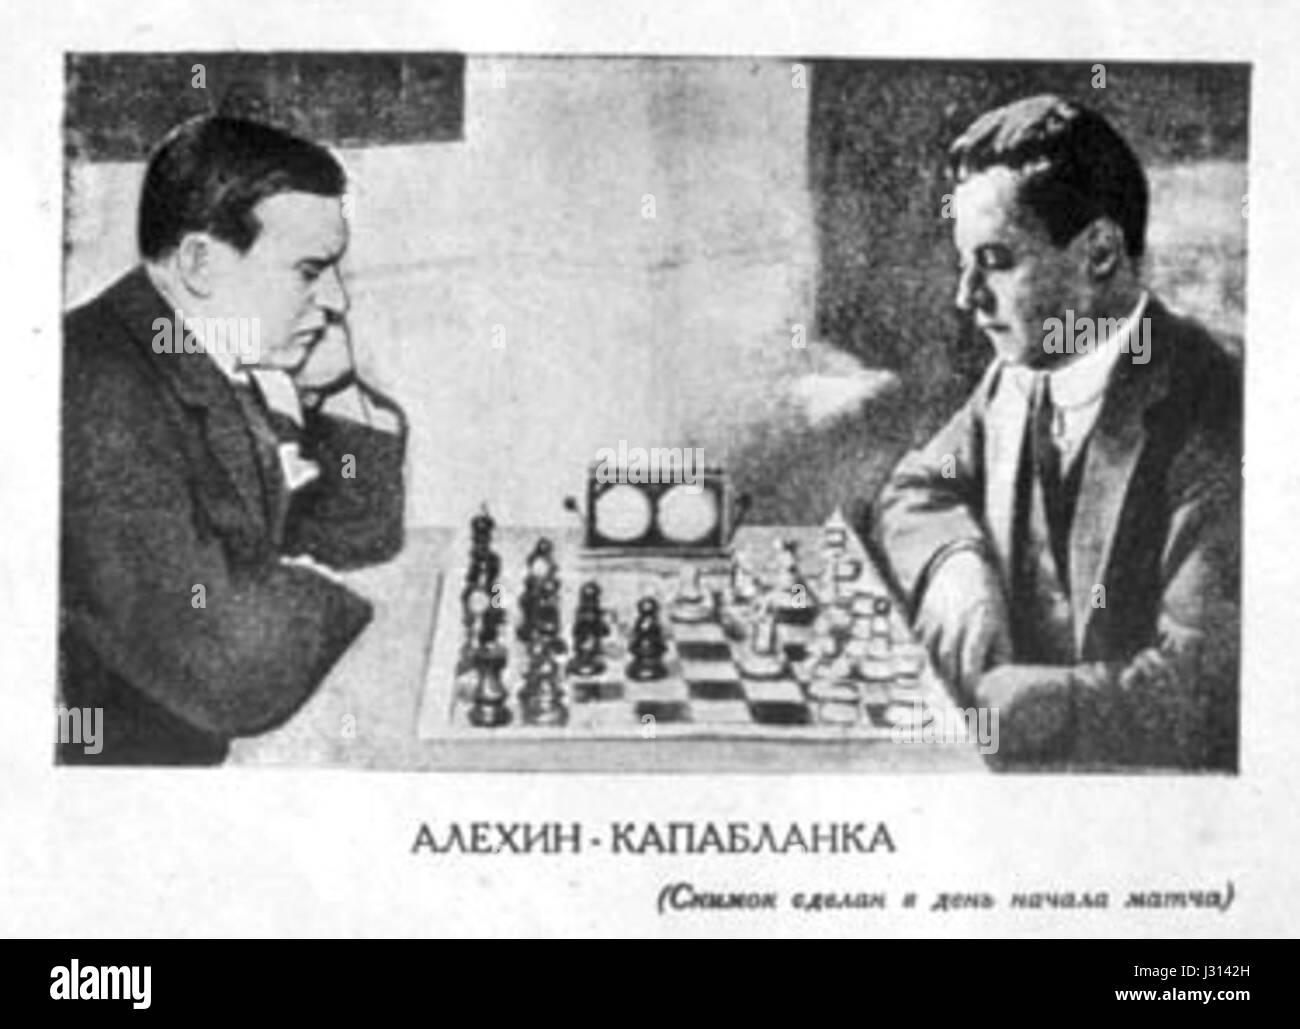 Alekhine Capablanca 1927 Stock Photo: 139552073 - Alamy